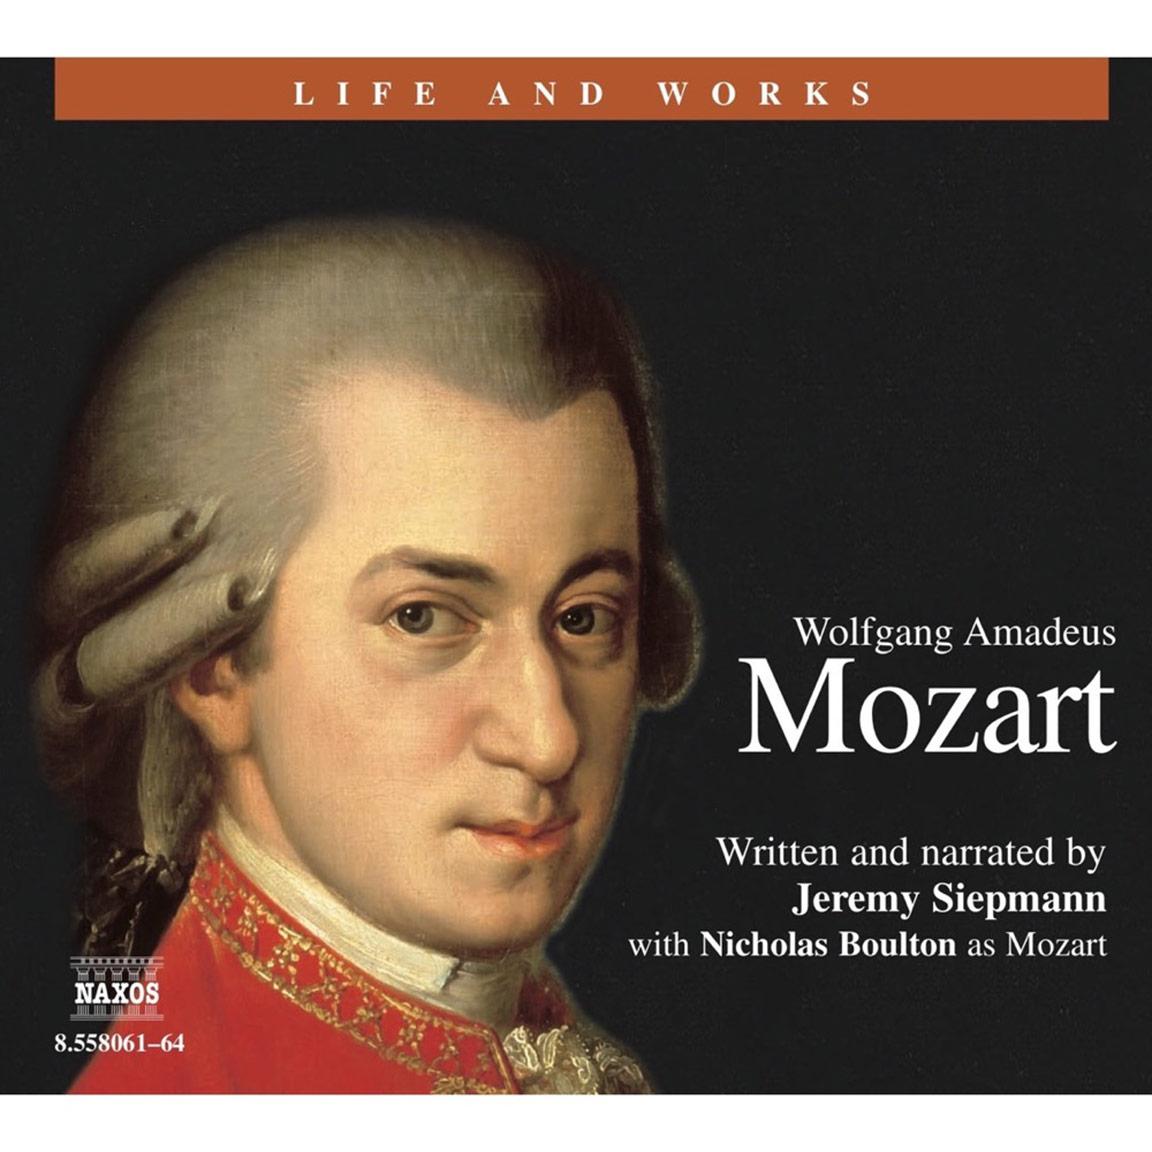 Mozart Lettere: Mozart, Wolfgang Amadeus (unabridged)